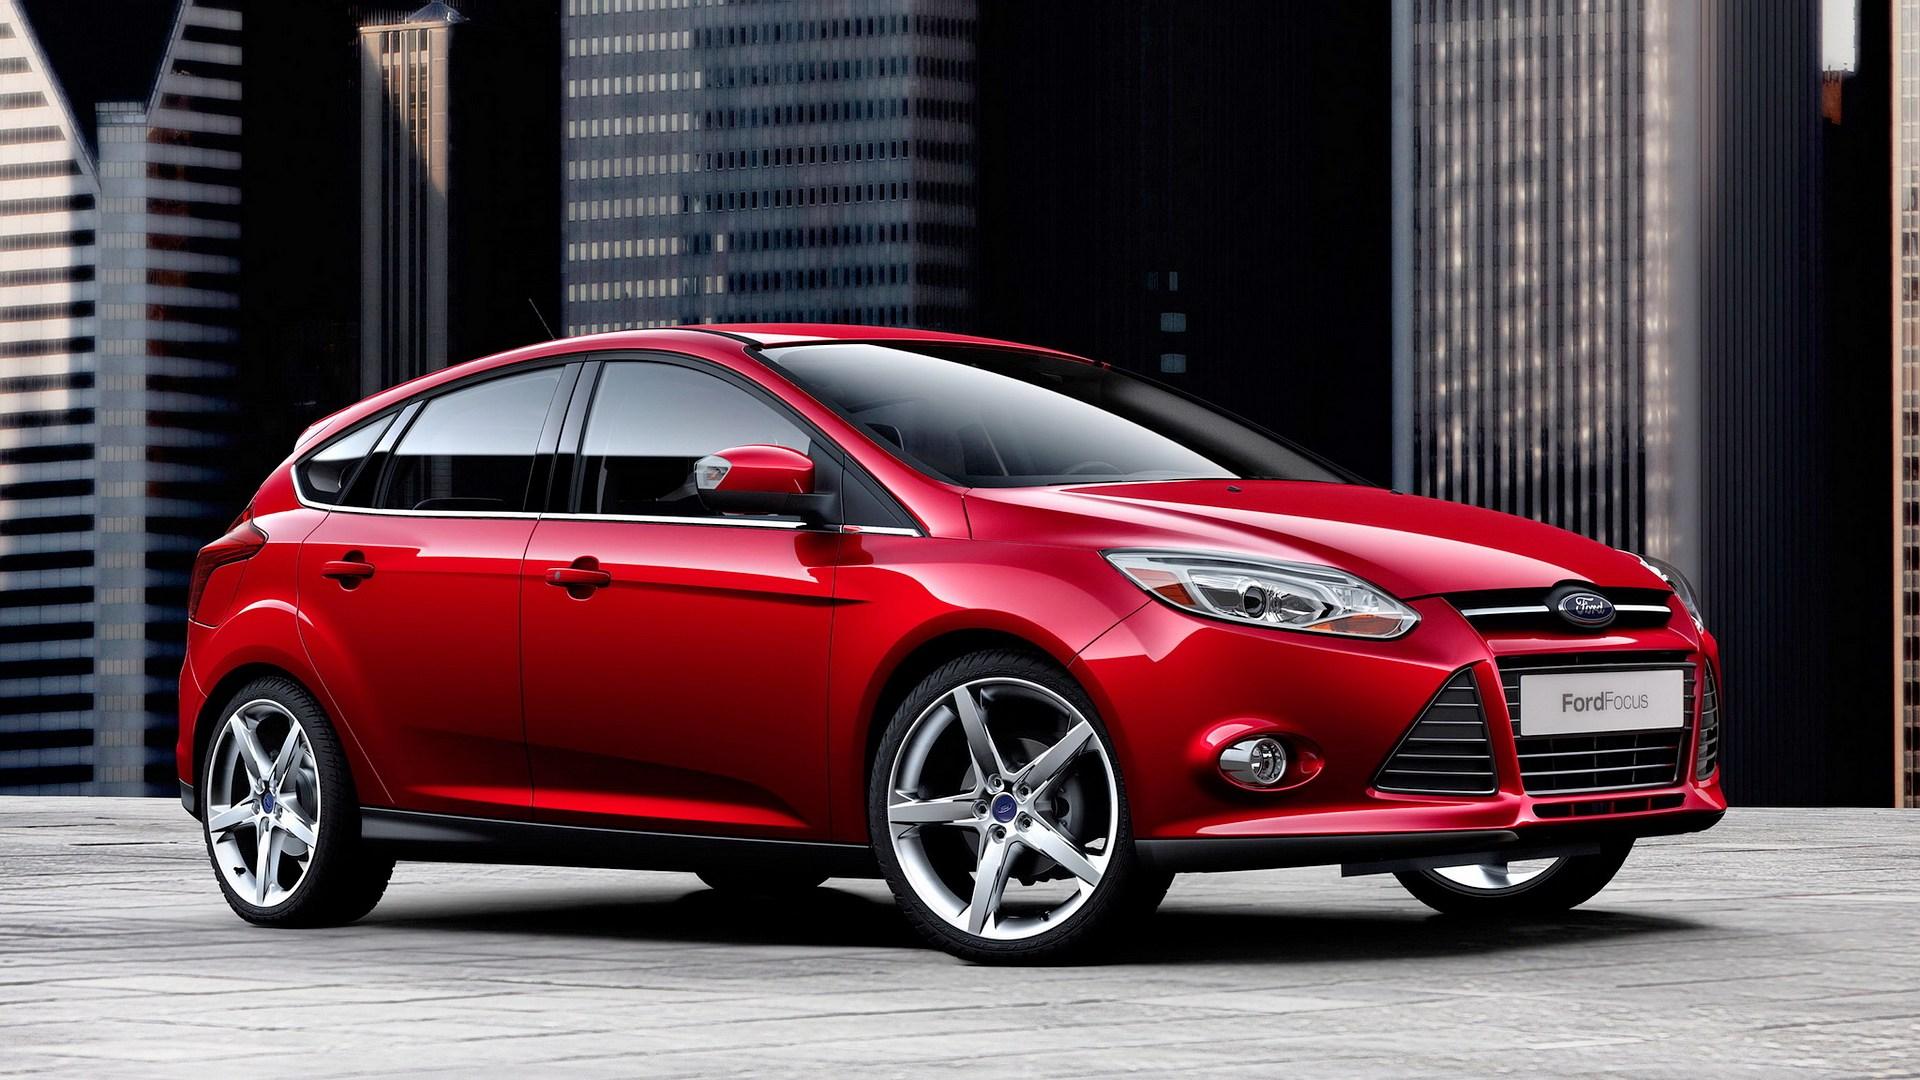 Ford Festiva 2012 foto - 3